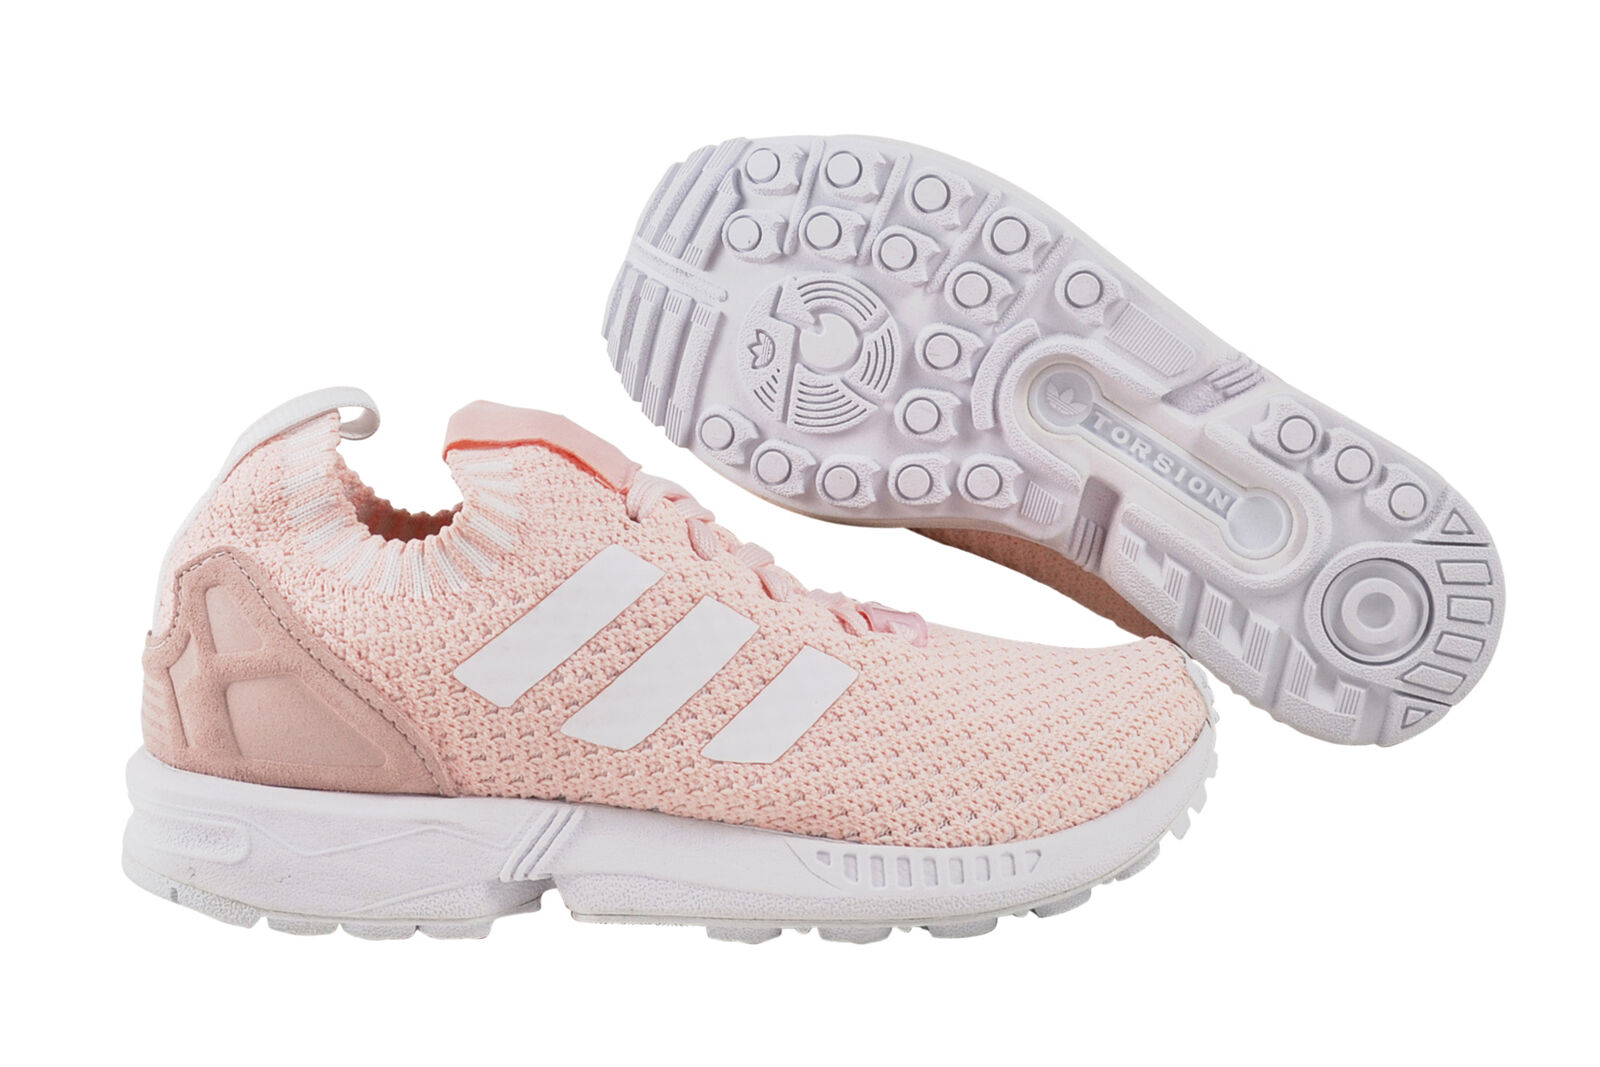 Zapatos promocionales para hombres y mujeres Adidas ZX Flux Primeknit Women halpin white Sneaker Schuhe rosa S81900